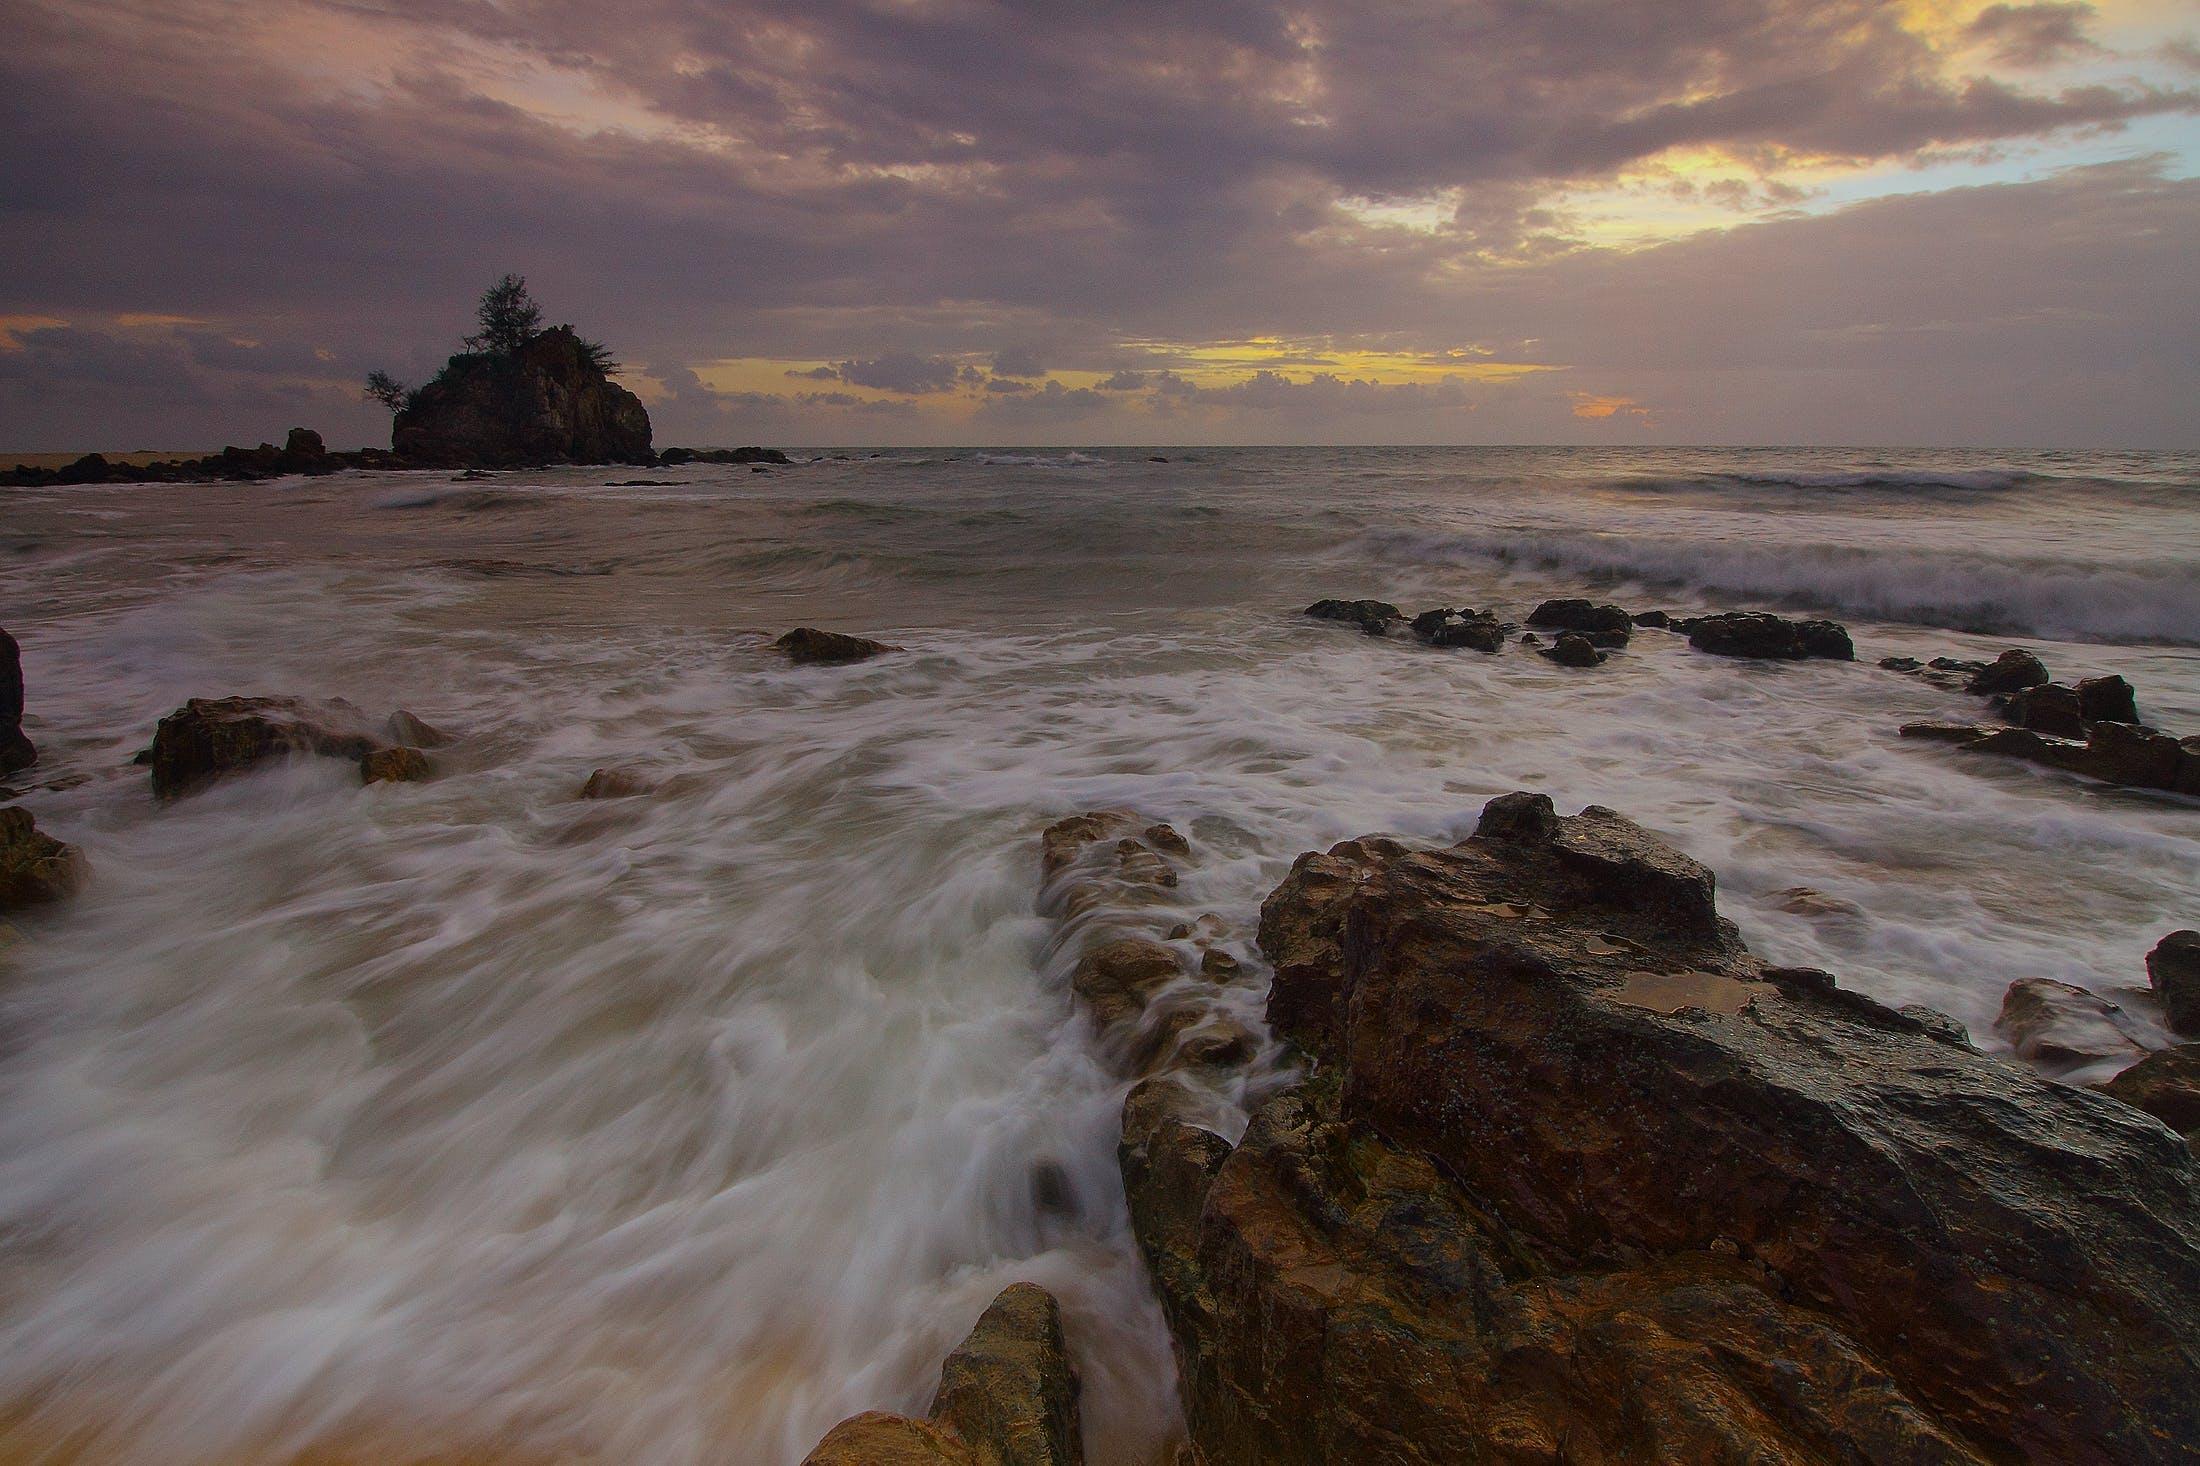 Flowing Water to the Ocean Under Grey Sky